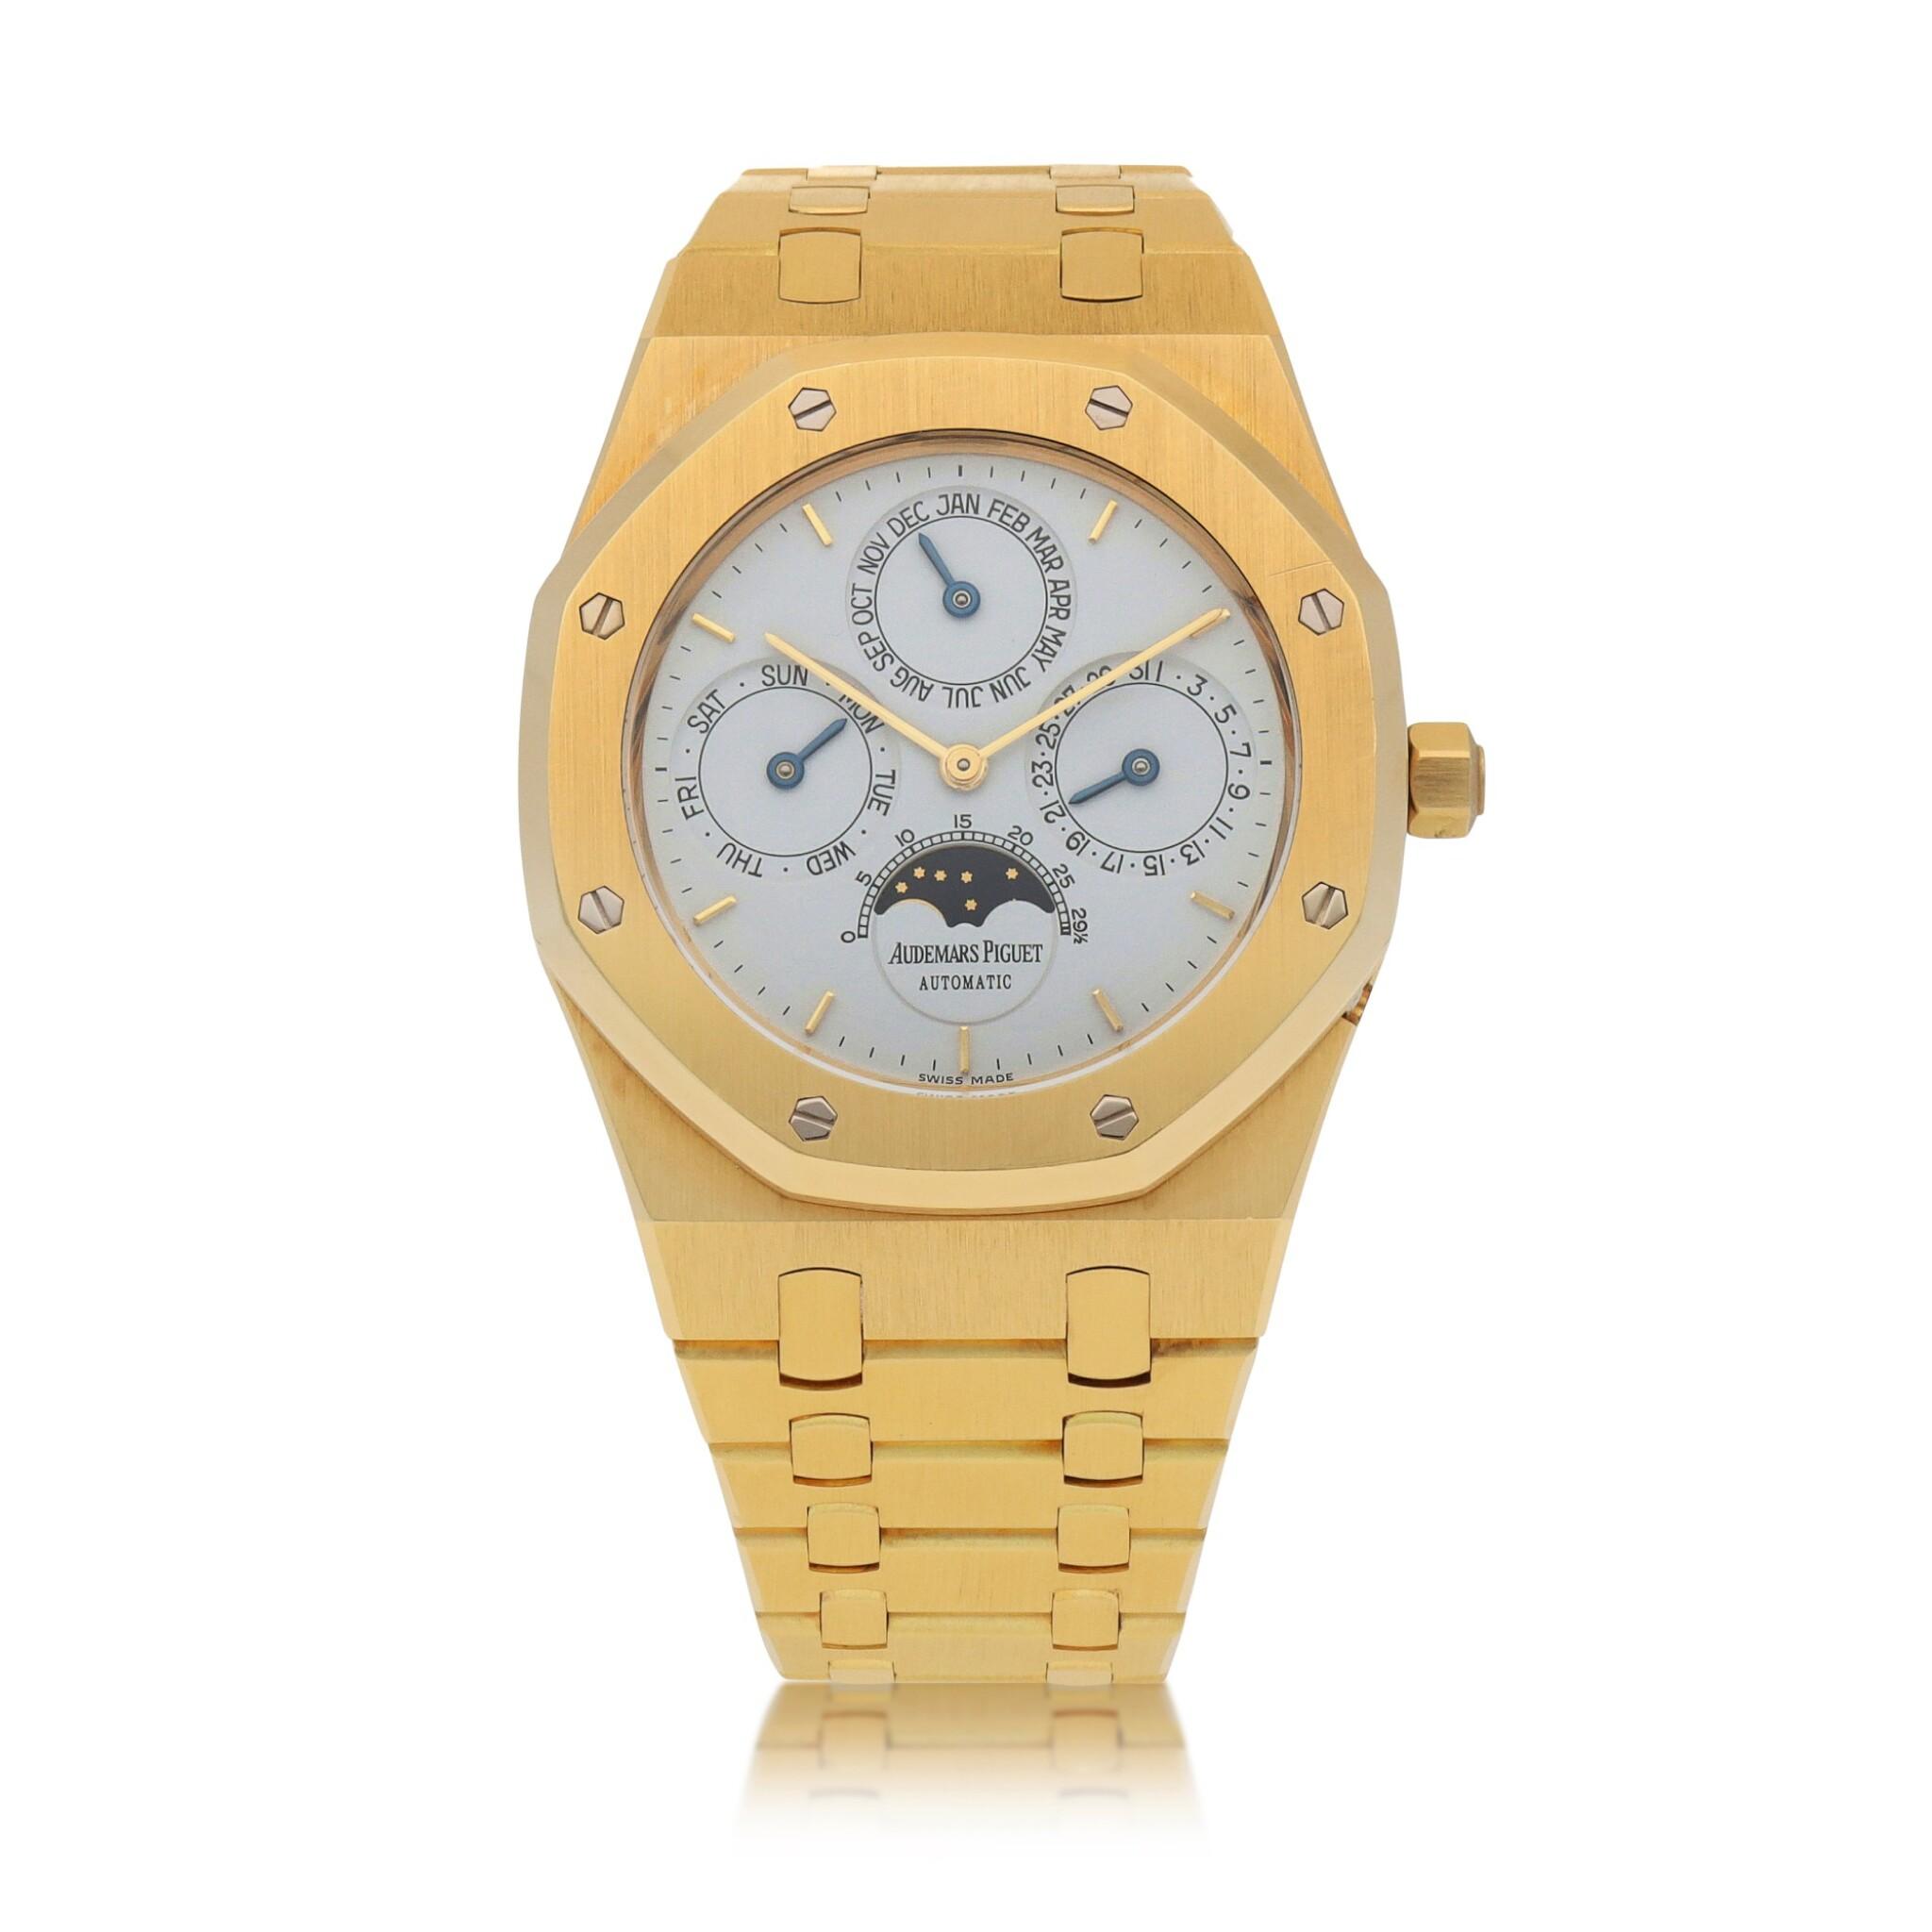 View full screen - View 1 of Lot 15. Royal Oak, Ref. 25654BA Yellow gold perpetual calendar wristwatch with moon phases and bracelet Circa 1996 | 25654BA型號「Royal Oak」黃金萬年曆鍊帶腕錶備月相顯示,年份約1996.